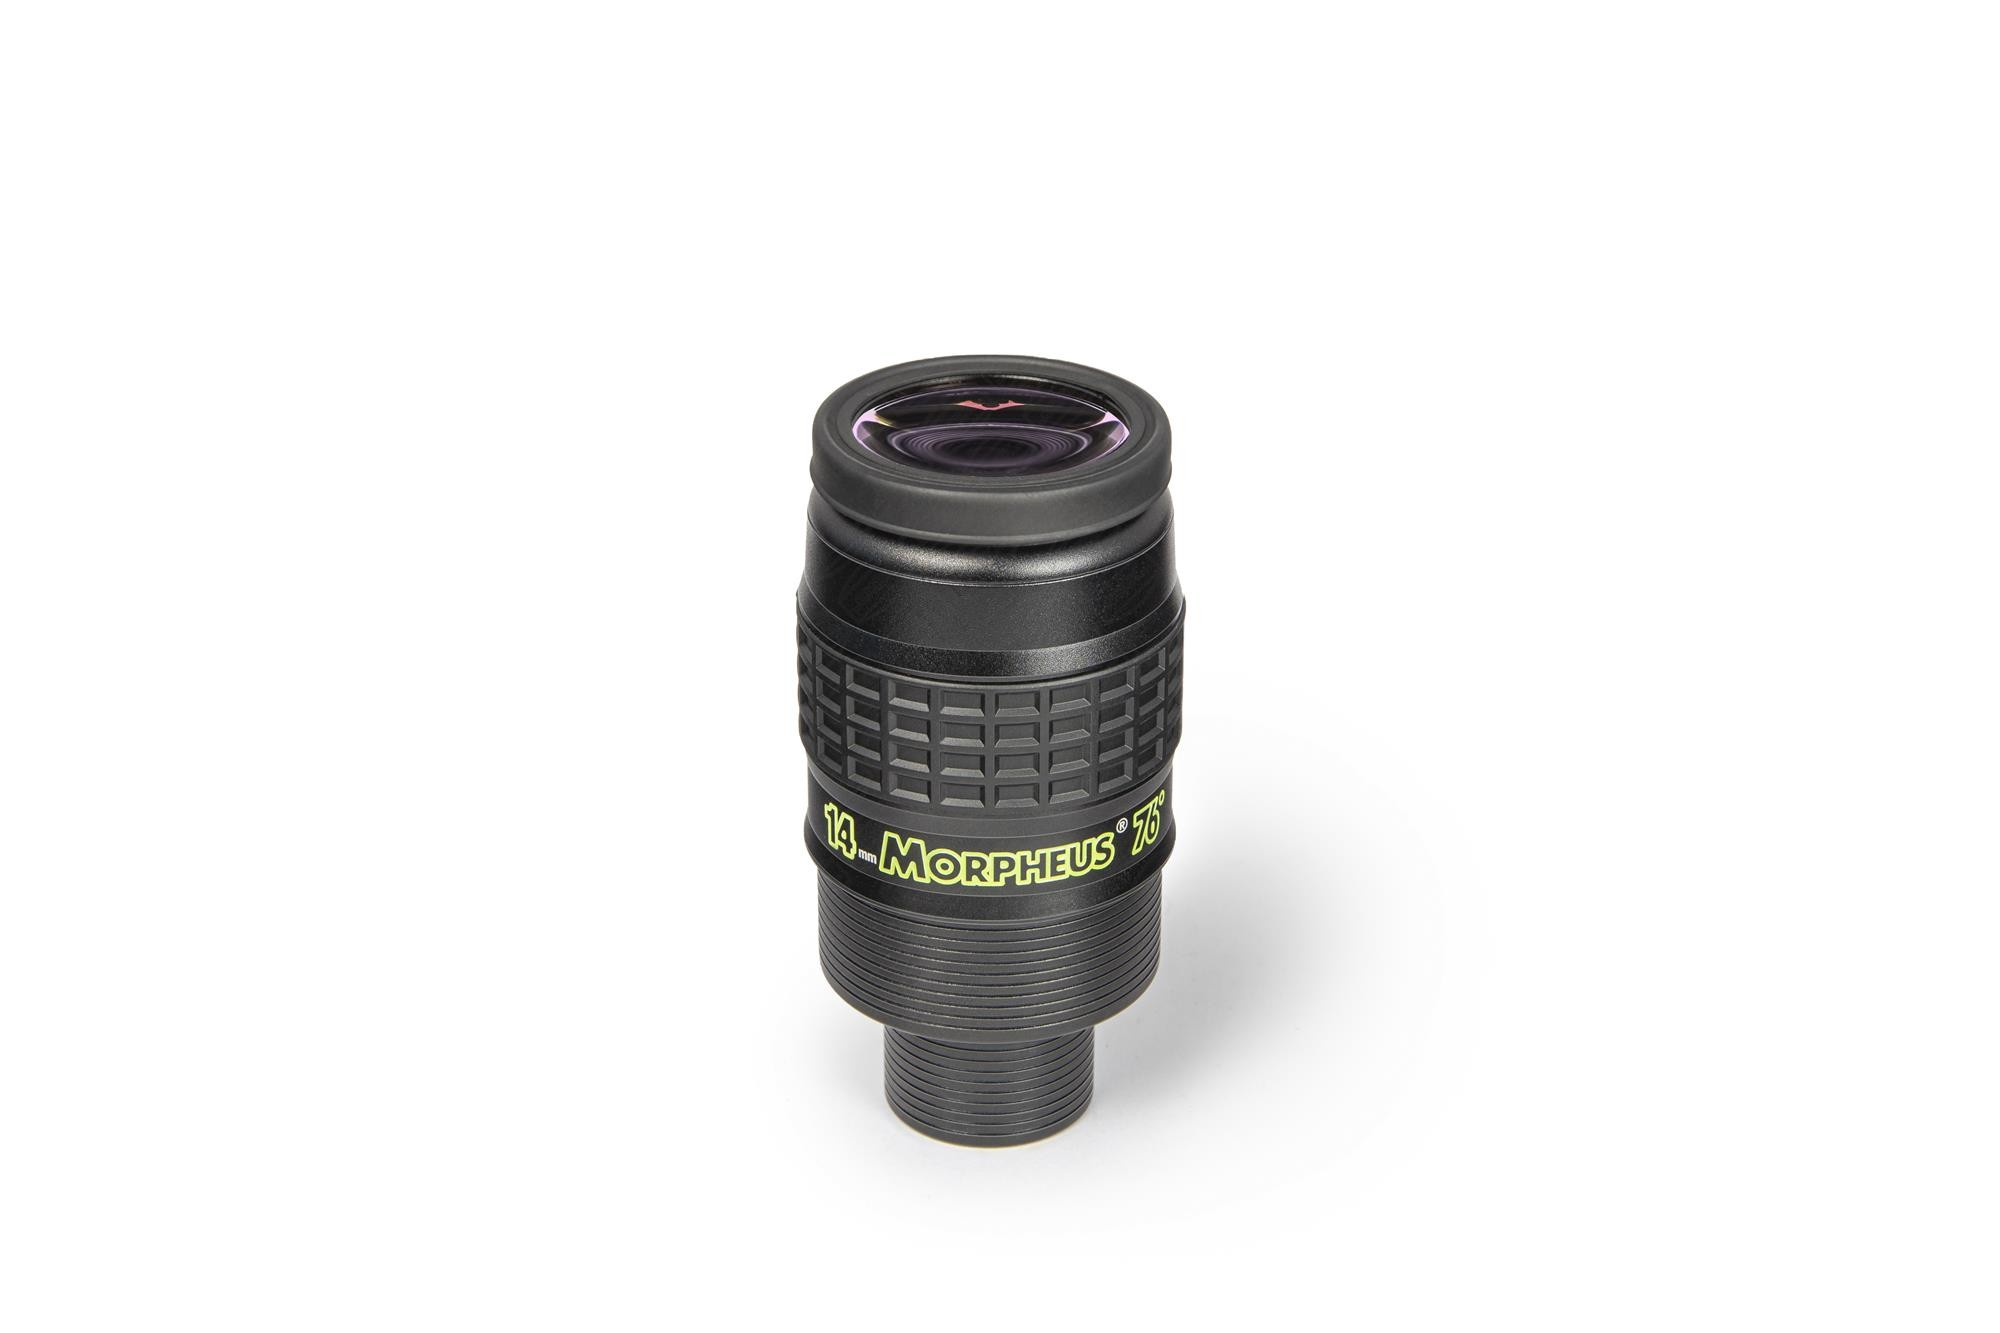 14 mm Morpheus® 76° widefield eyepiece